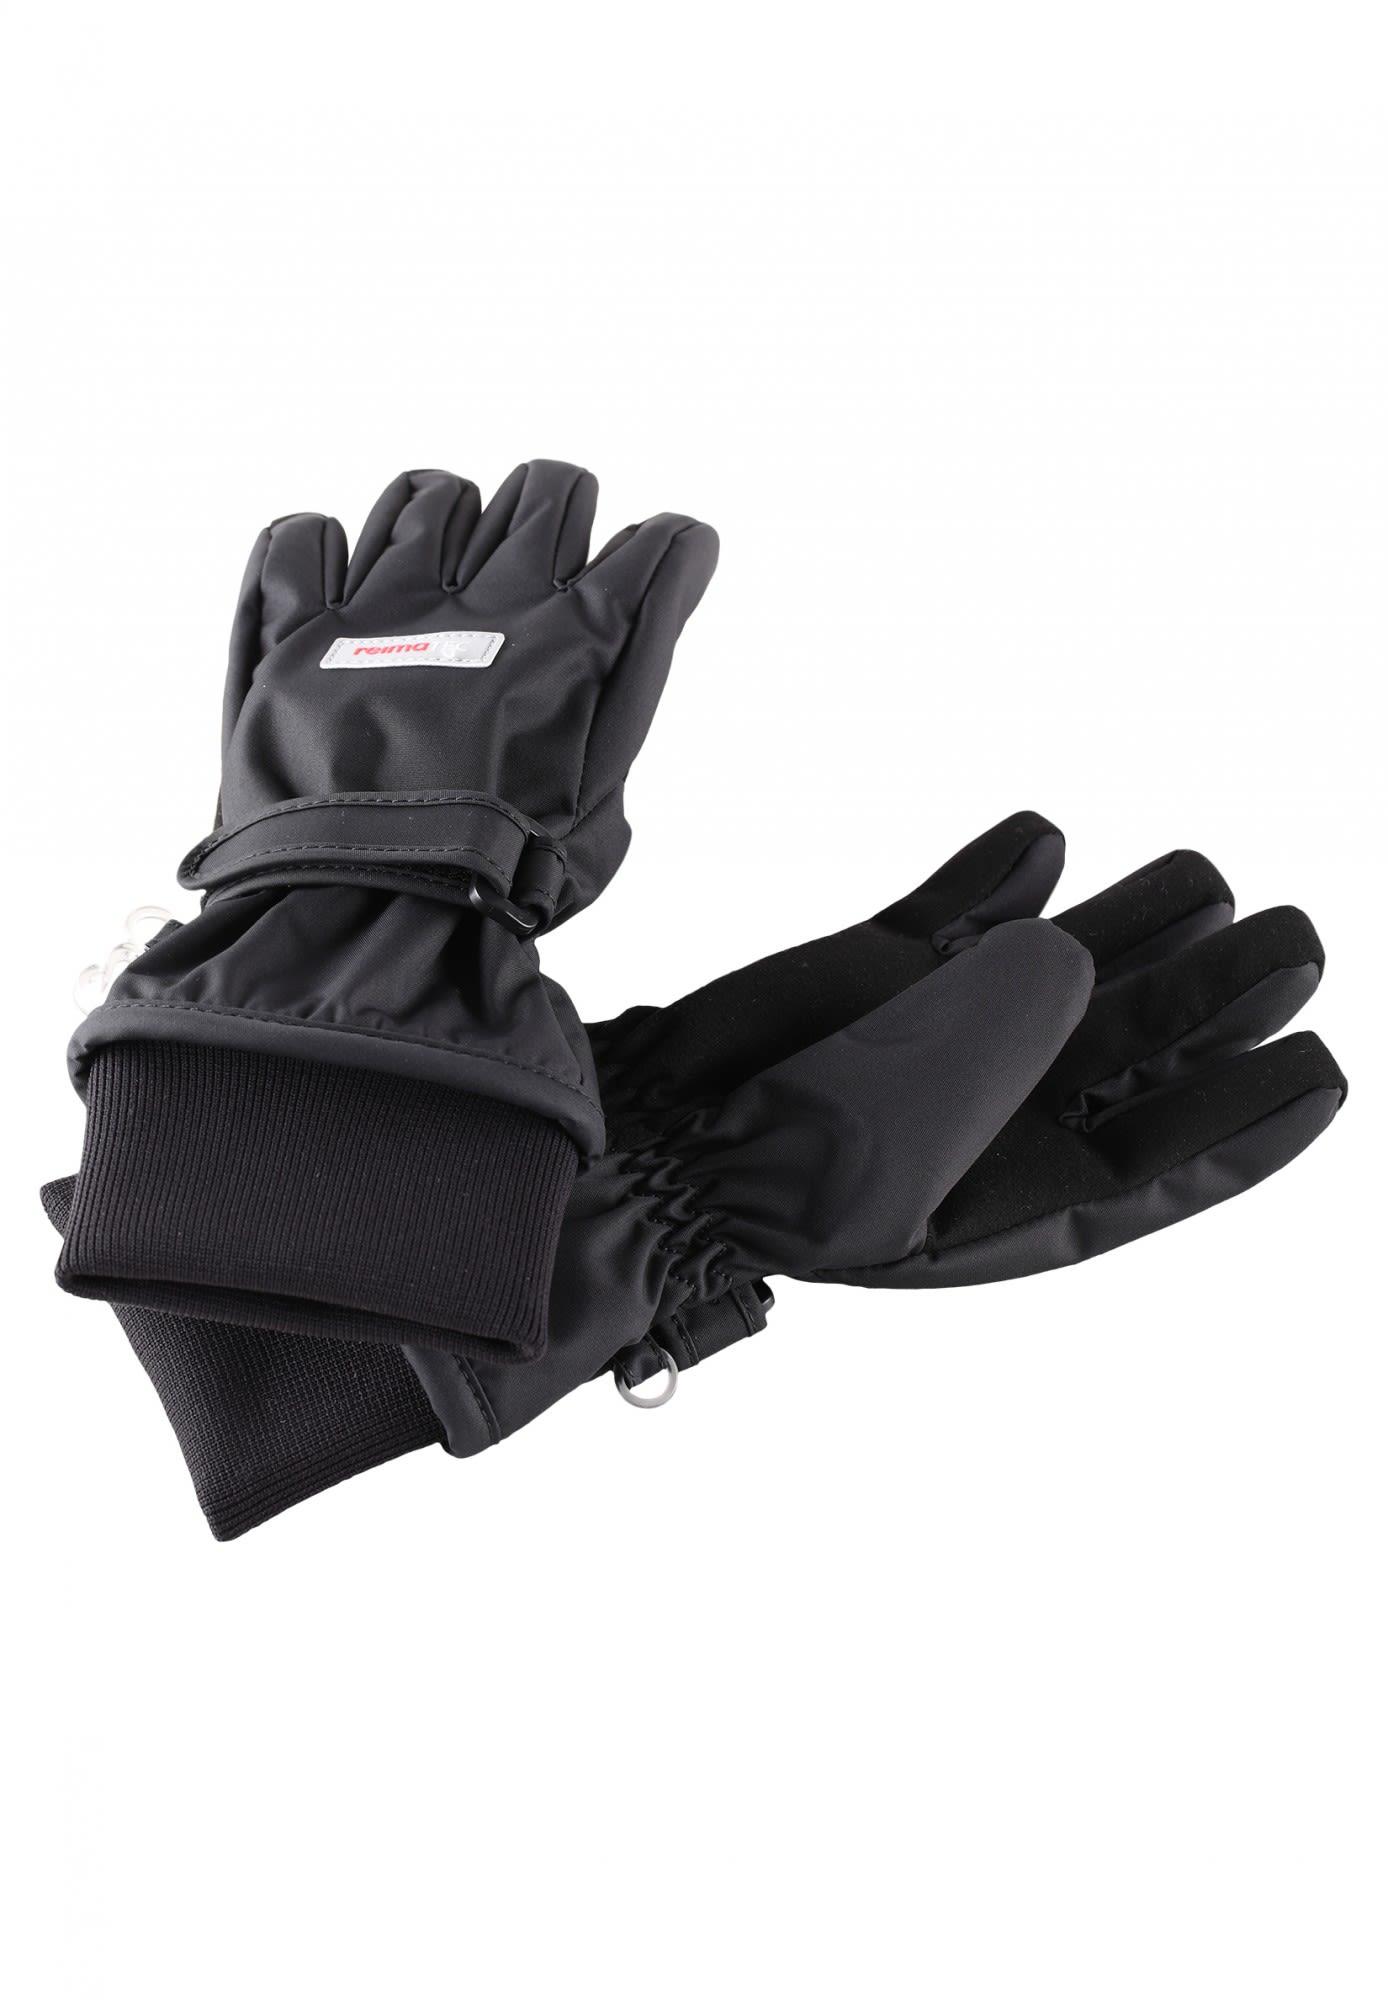 Reima Kids Tartu Gloves | Größe 6,7,8,5 | Kinder Fingerhandschuh